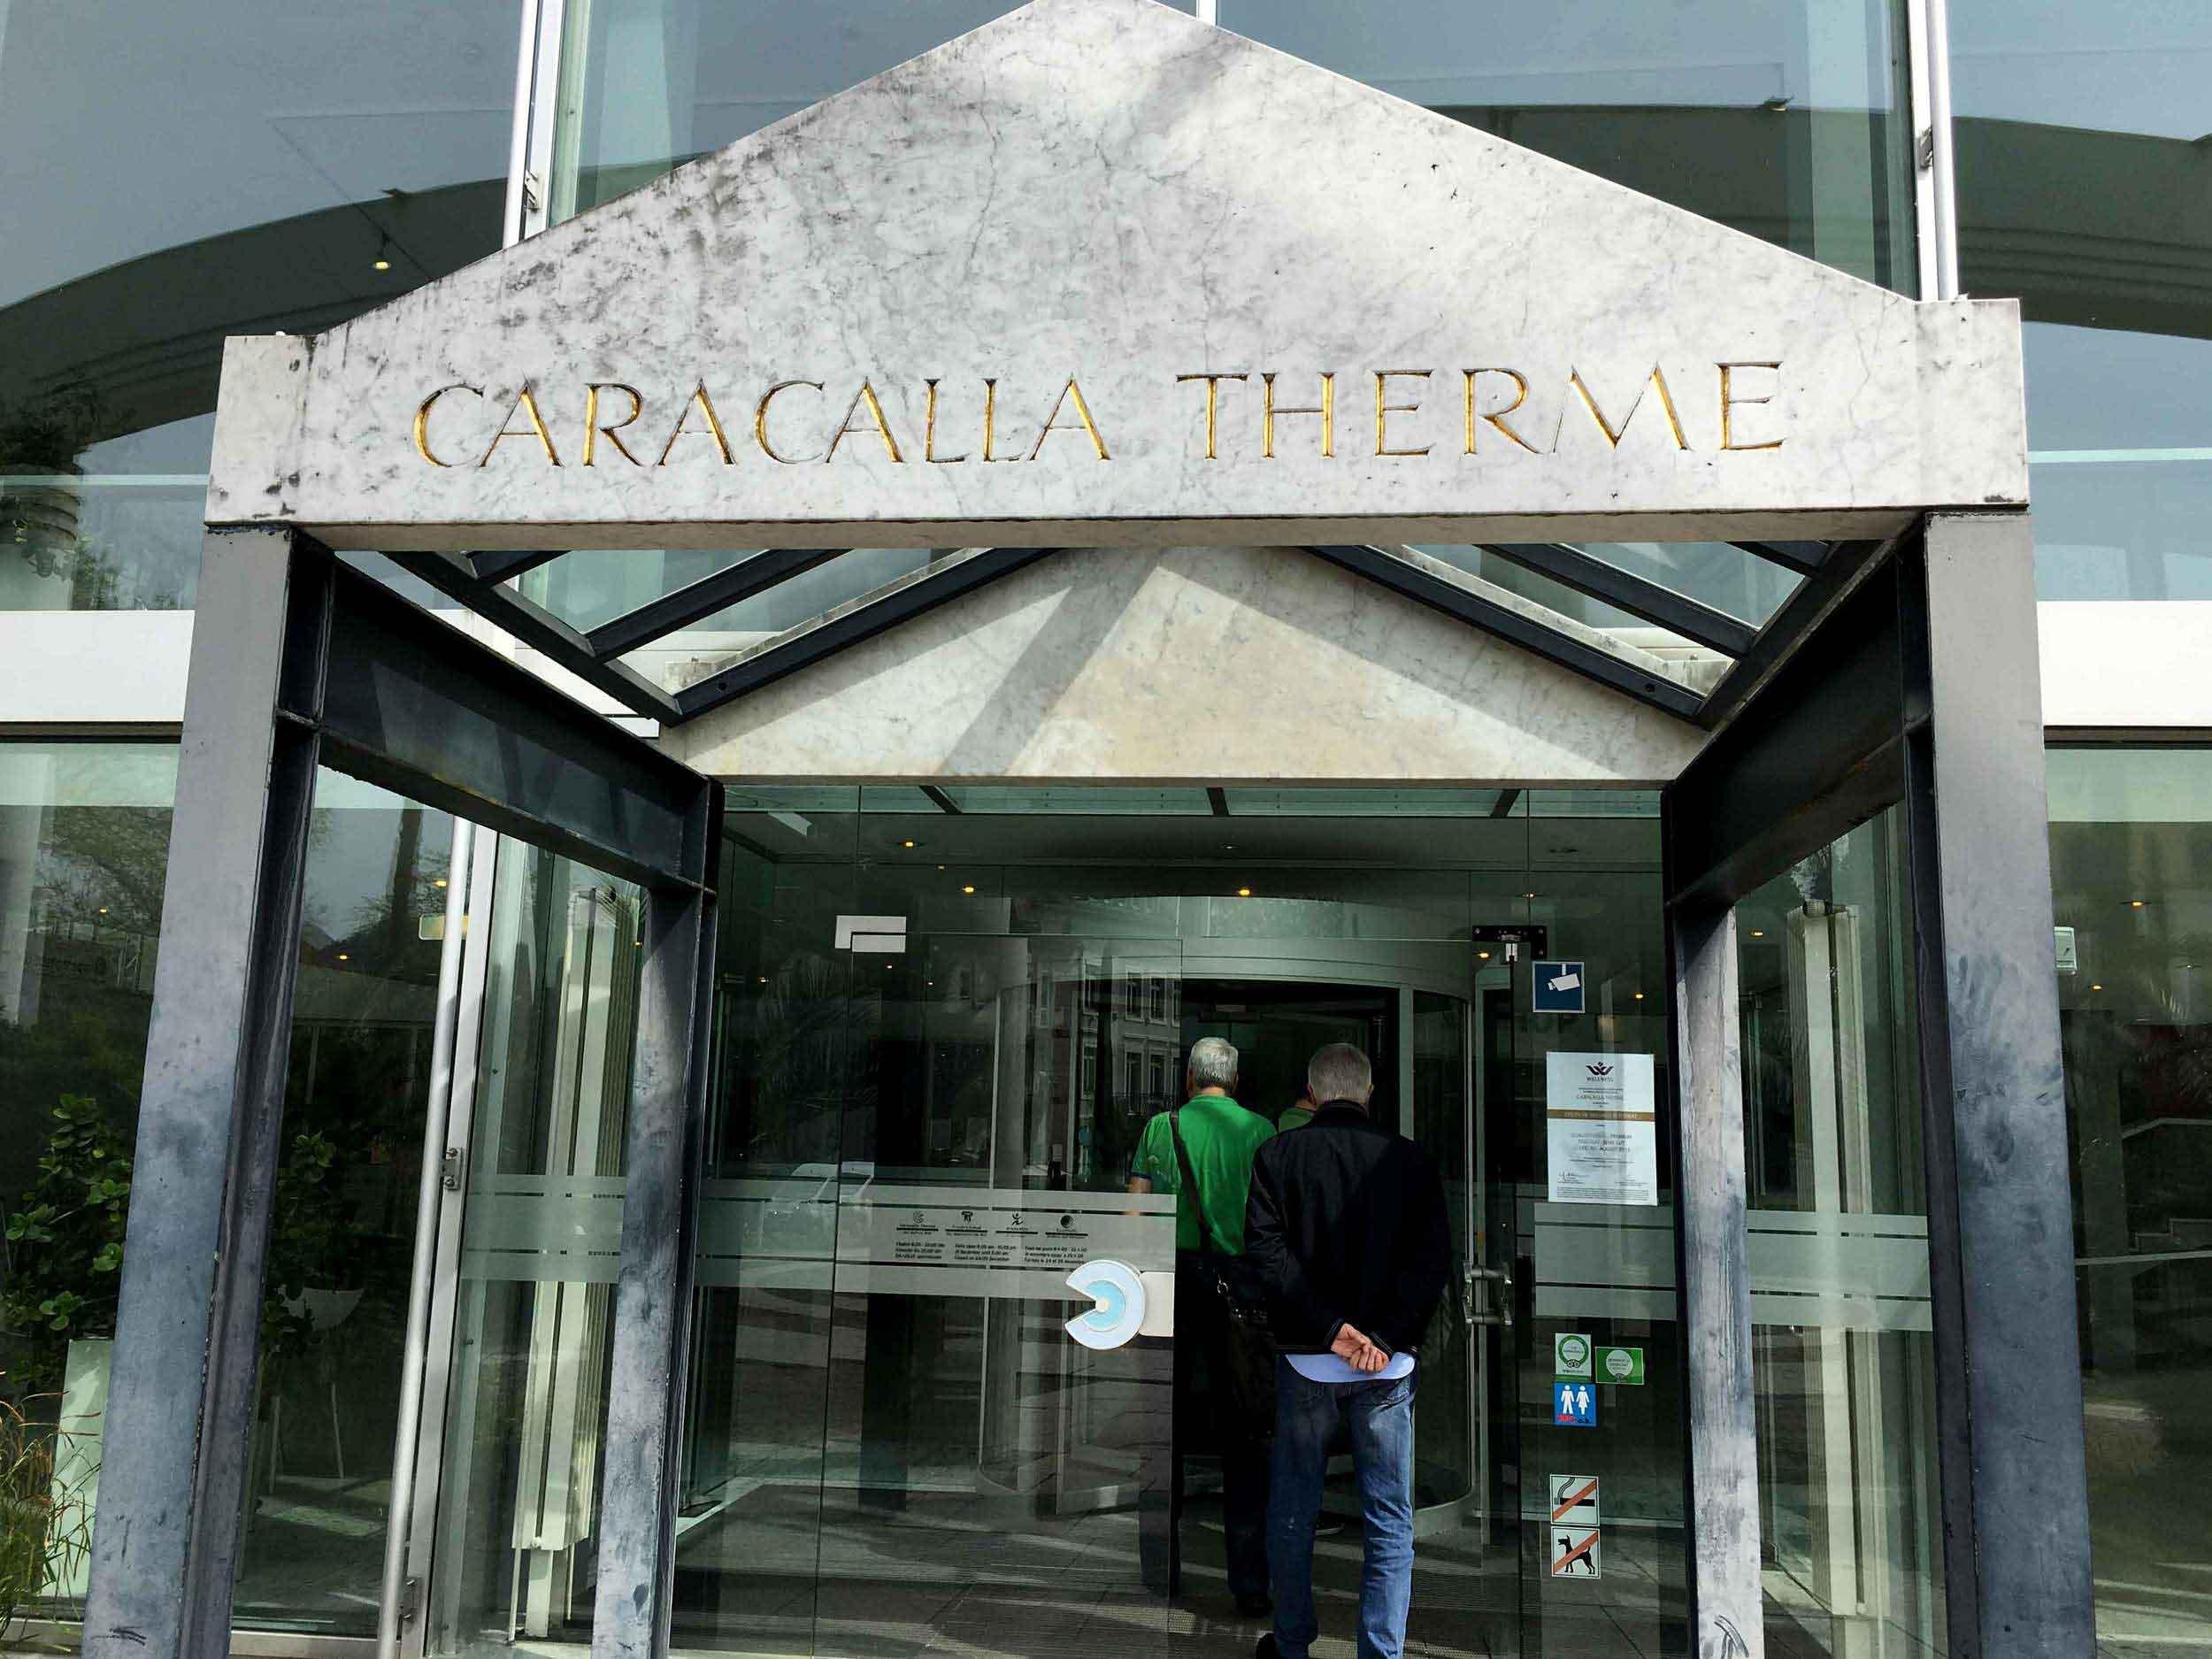 Caracalla Therme,Baden Baden, Germany. Image©thingstodot.com